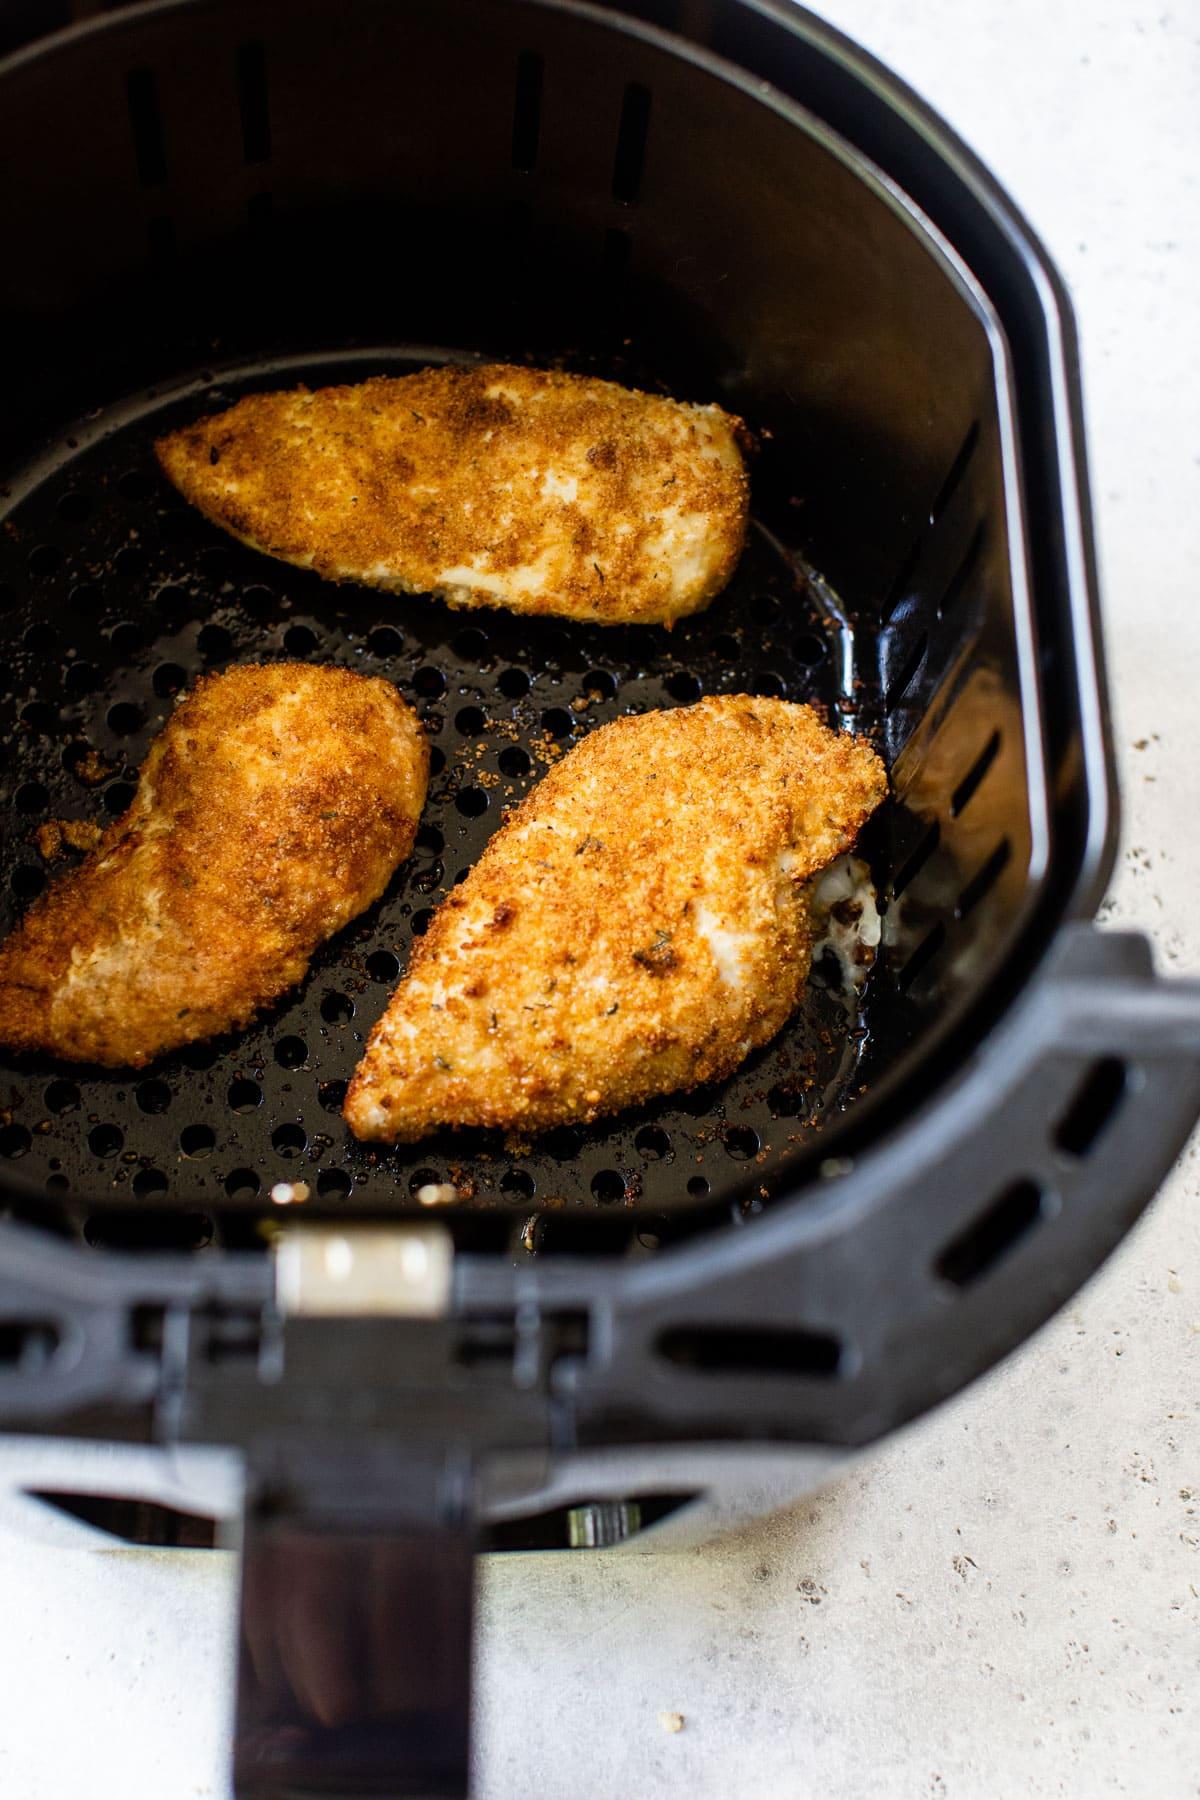 crispy air fryer fried chicken breasts in the air fryer